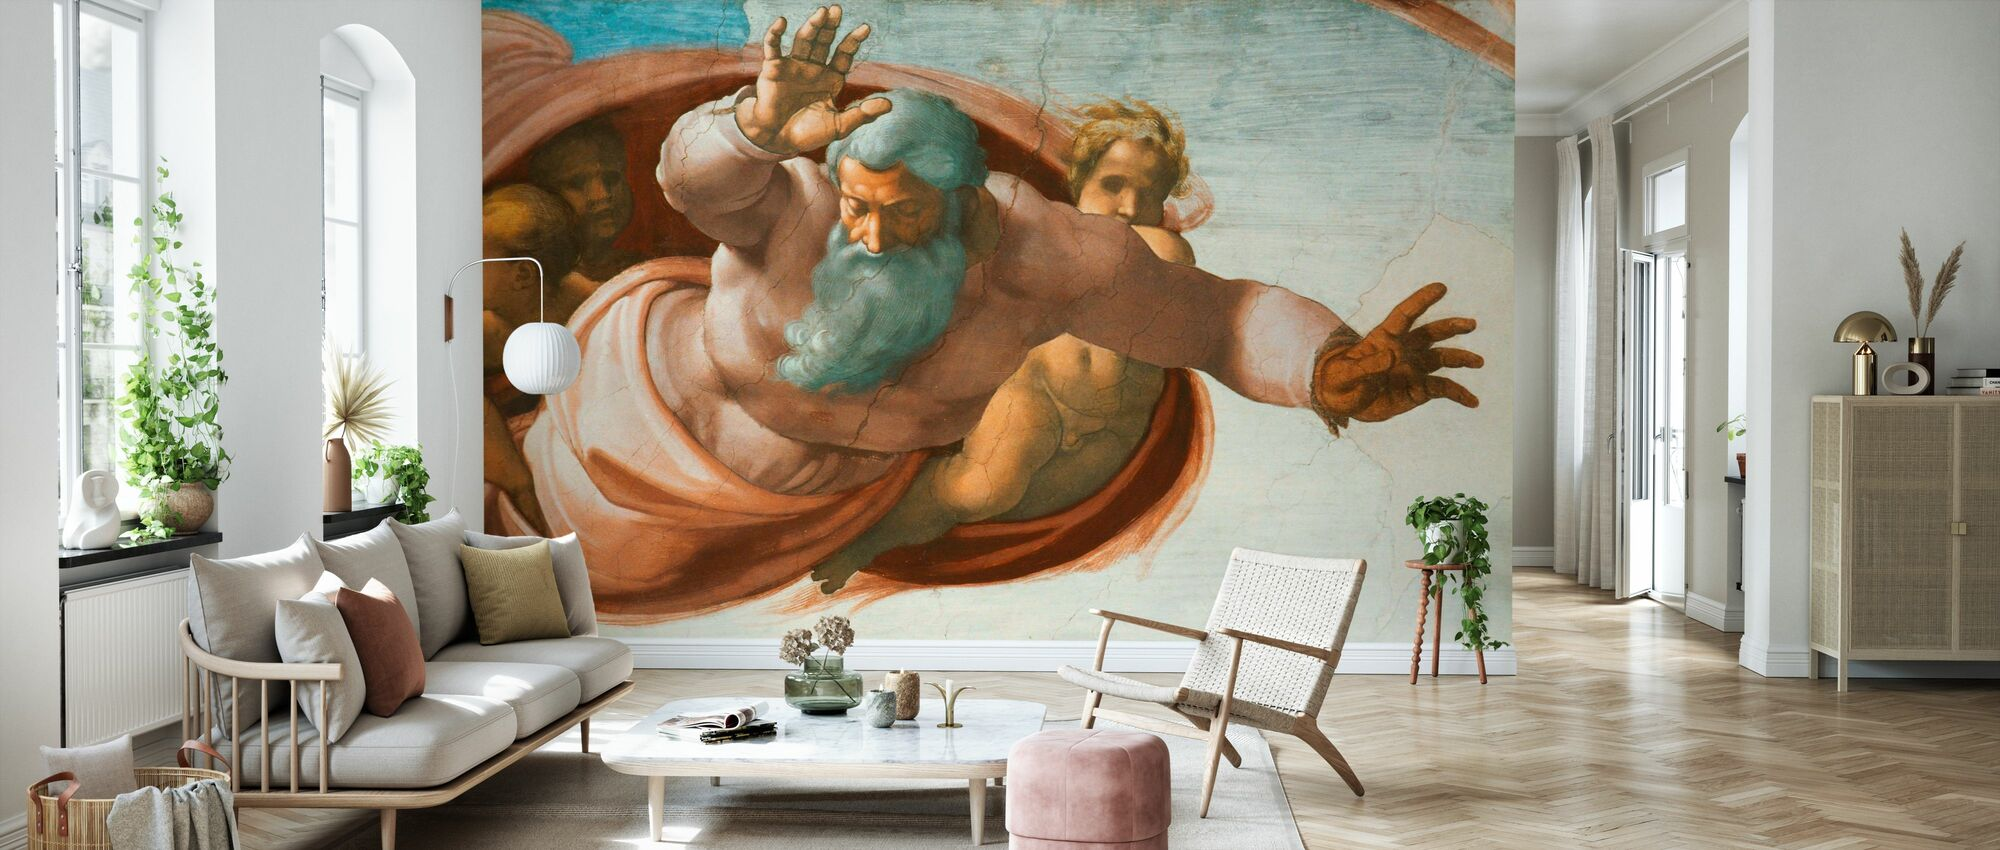 Sistine Chapel - Michelangelo Buonarroti - Wallpaper - Living Room